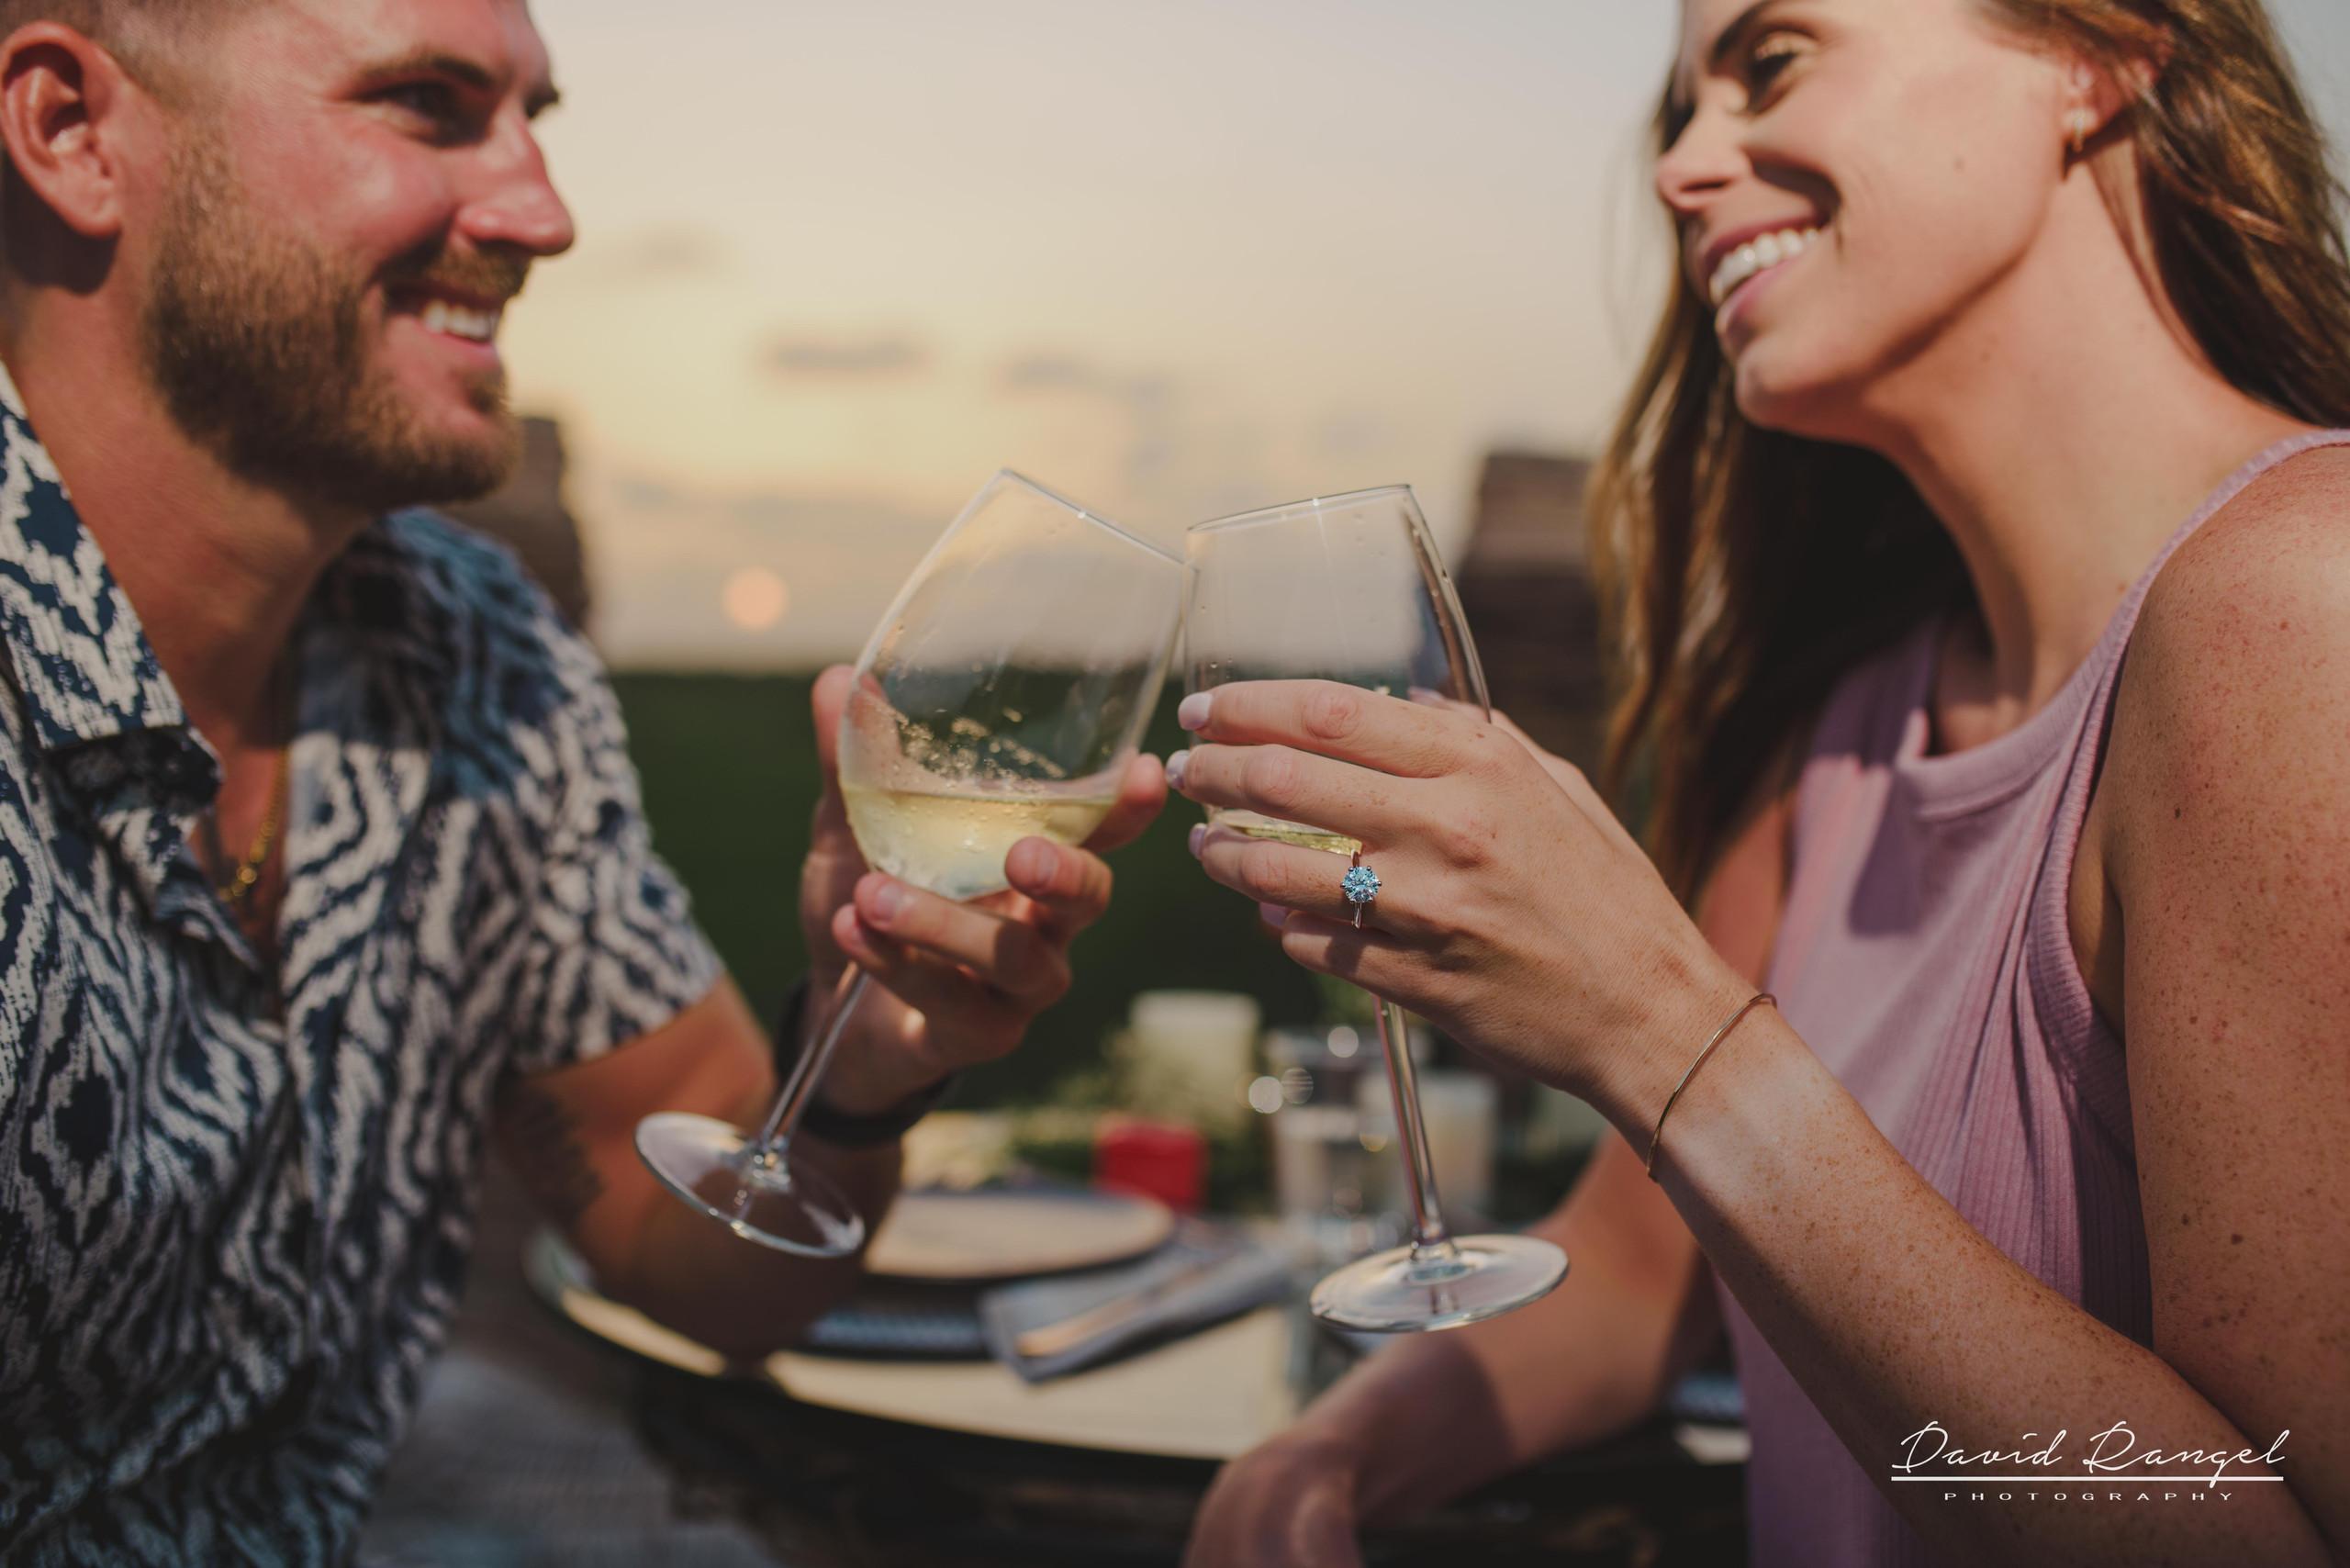 proposal+engagement+couple+dinner+hun+tulum+love+garden+nature+overthetrees+session+photoshot+destination+photographer+photo+celebration+sunset